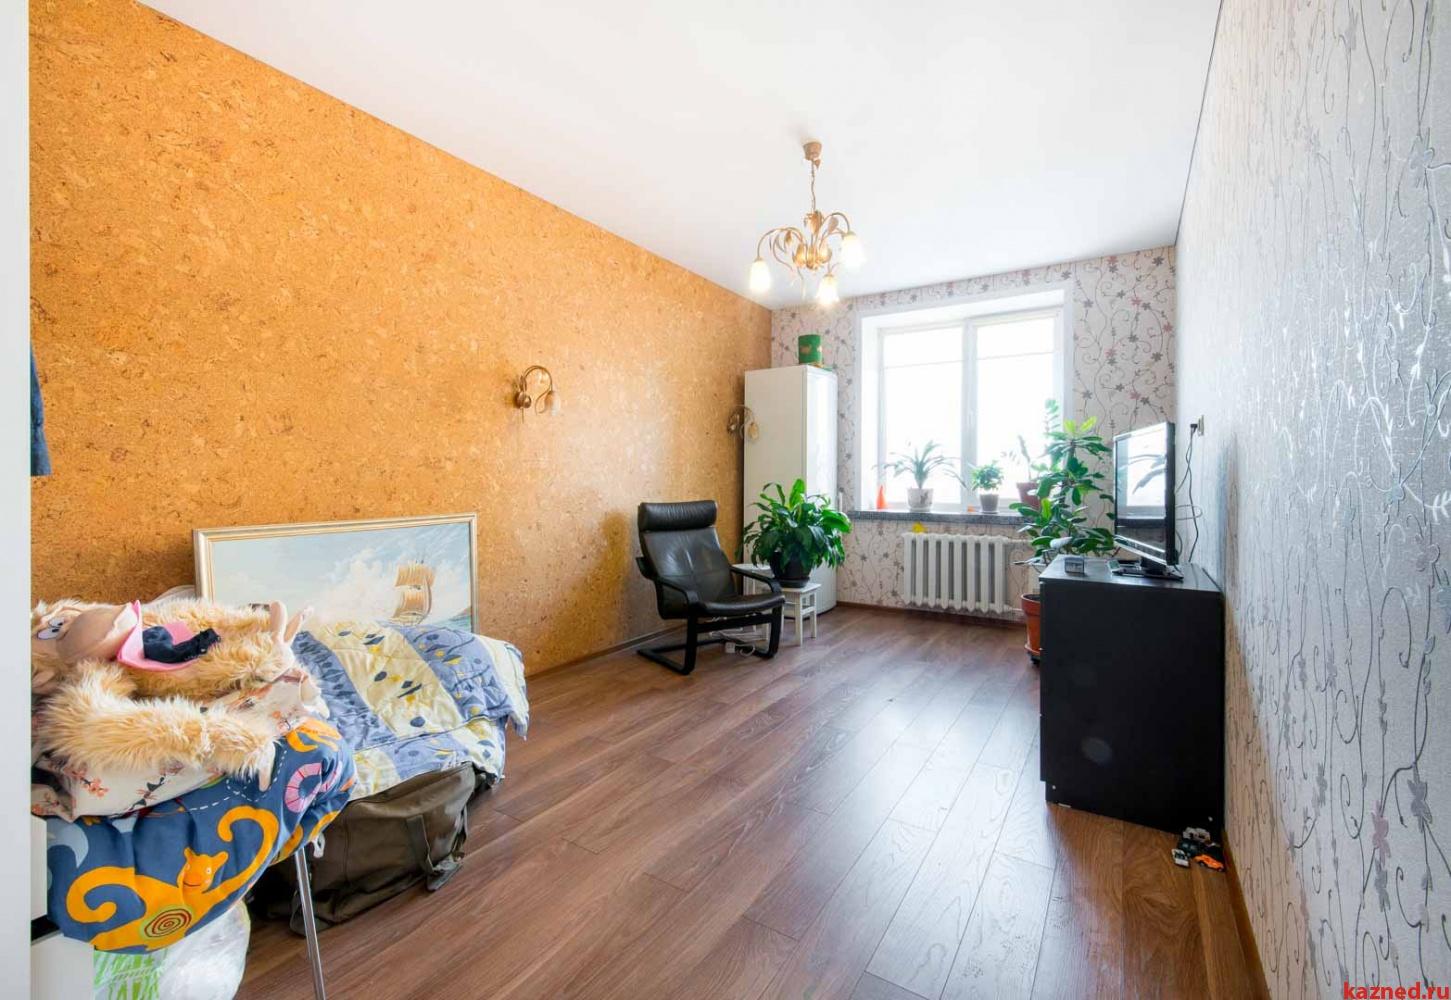 Продажа 3-к квартиры Баки Урманче д.8, 92 м2  (миниатюра №9)